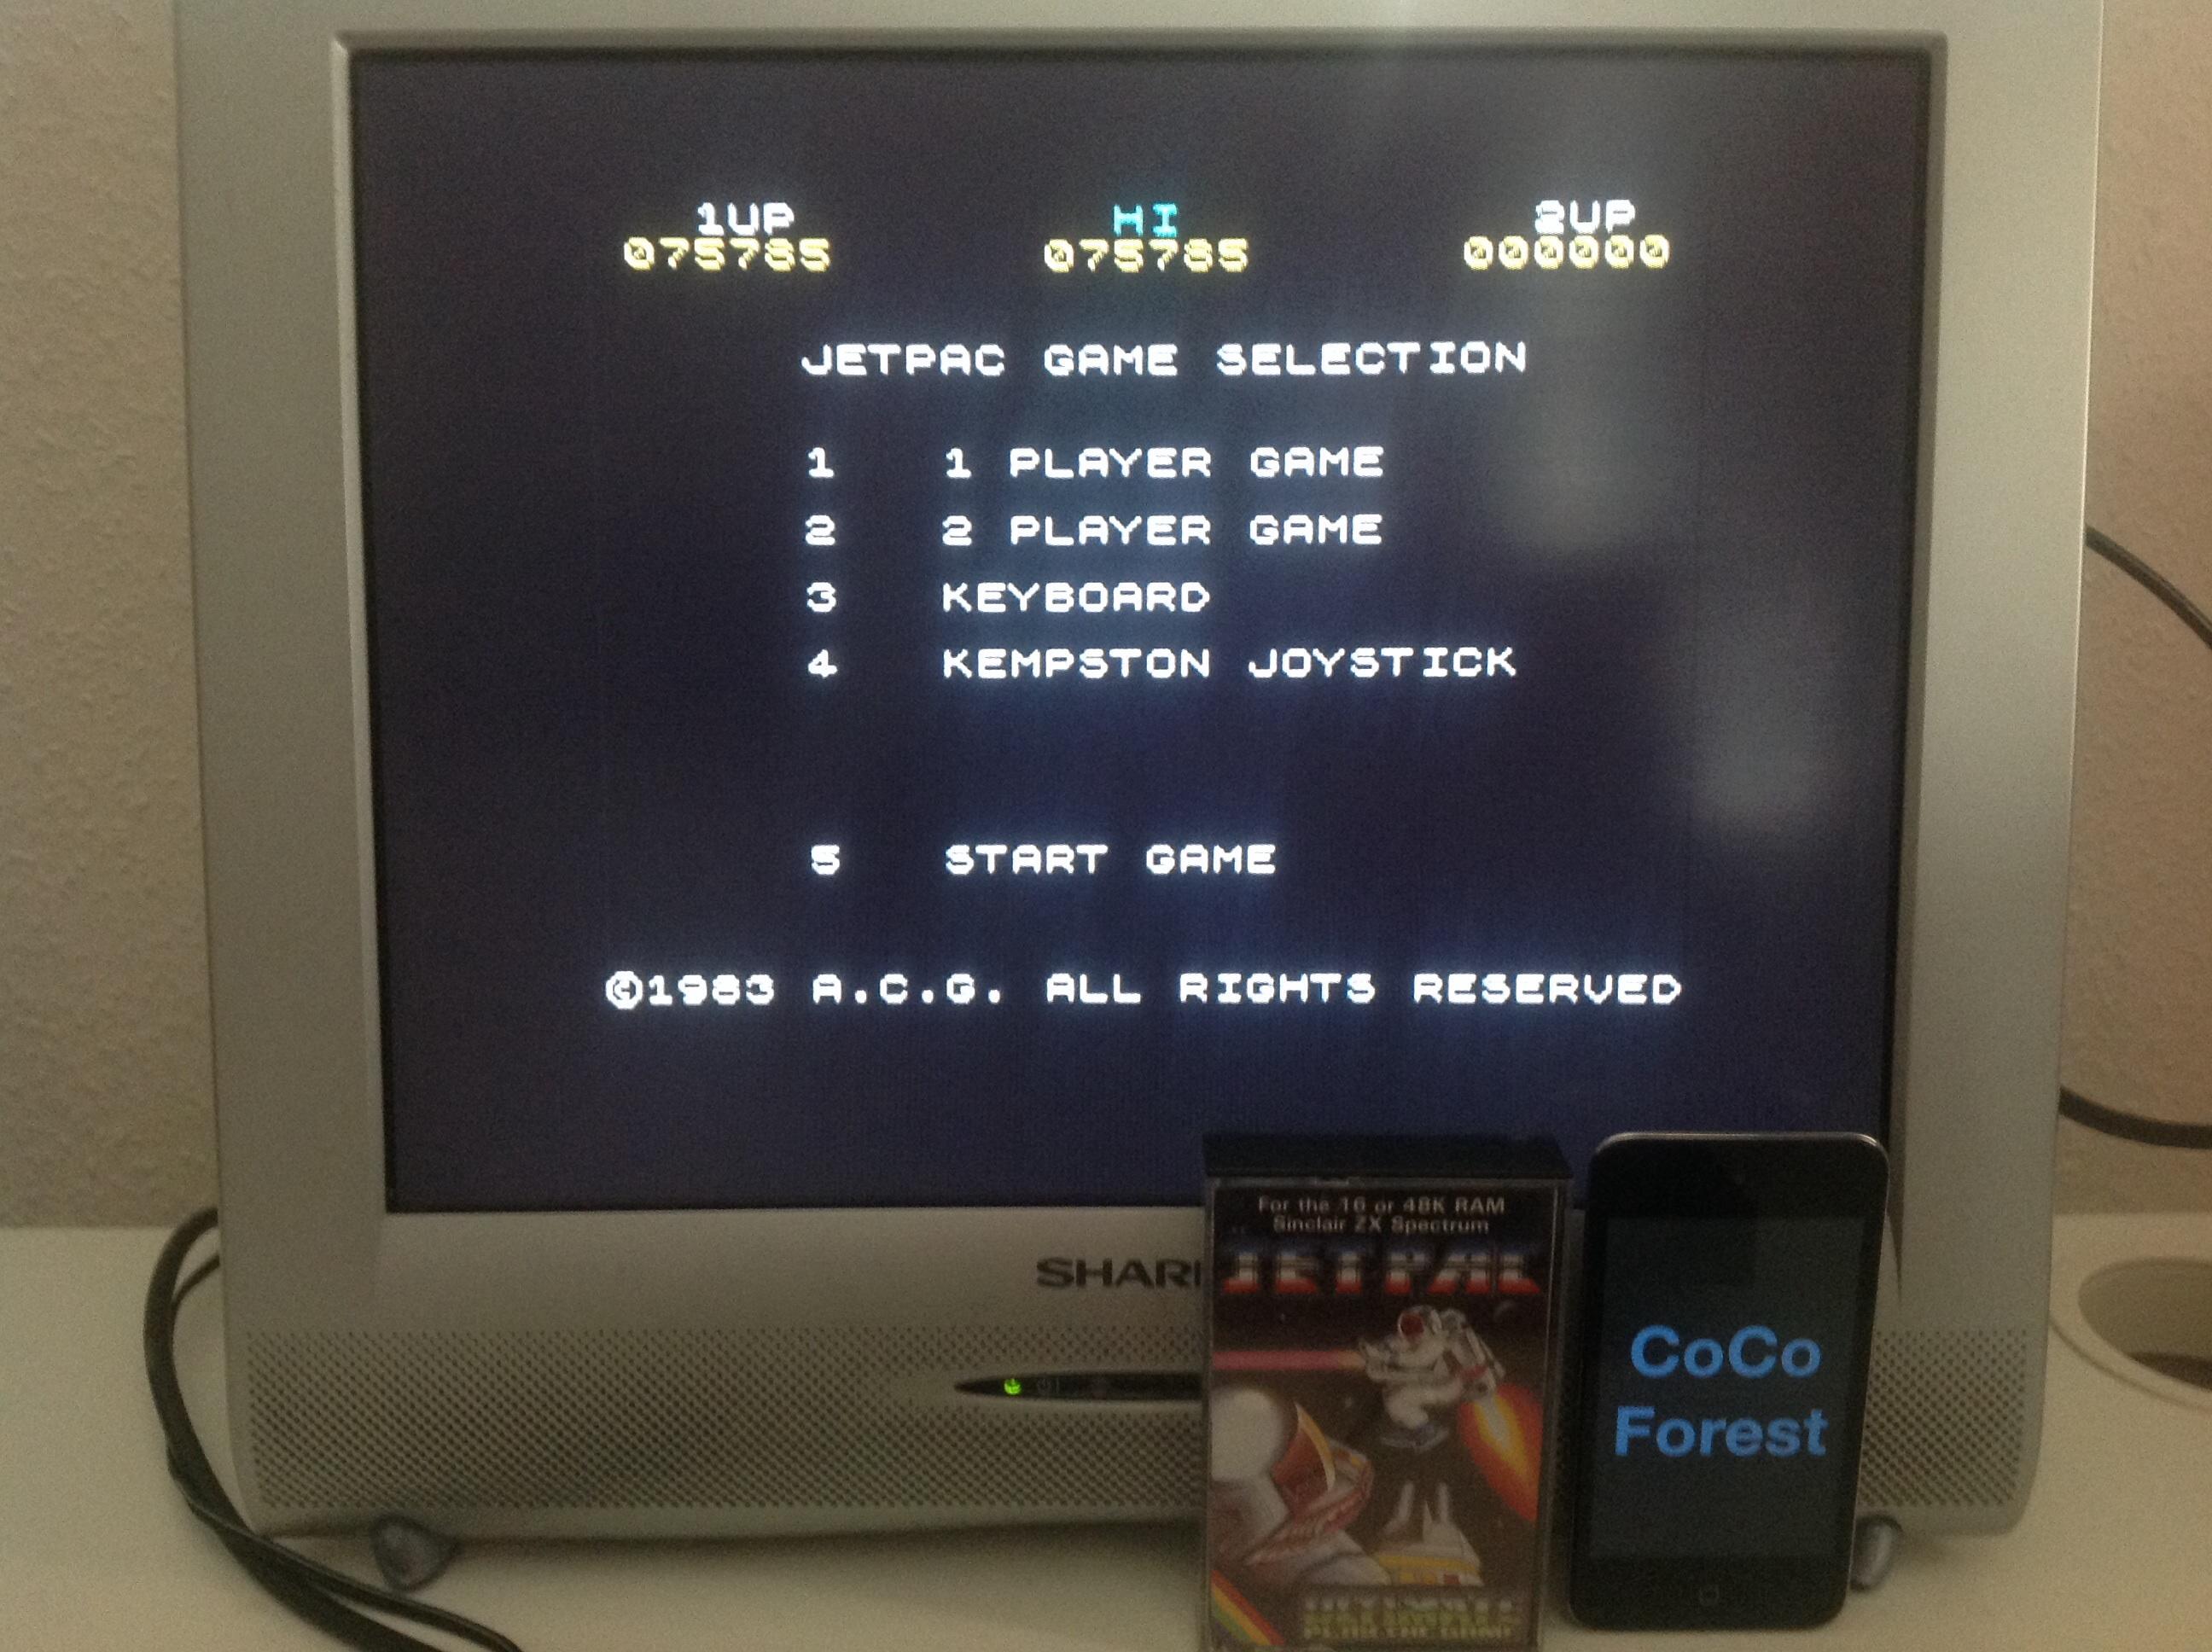 CoCoForest: Jetpac (ZX Spectrum) 75,785 points on 2014-05-19 11:39:30